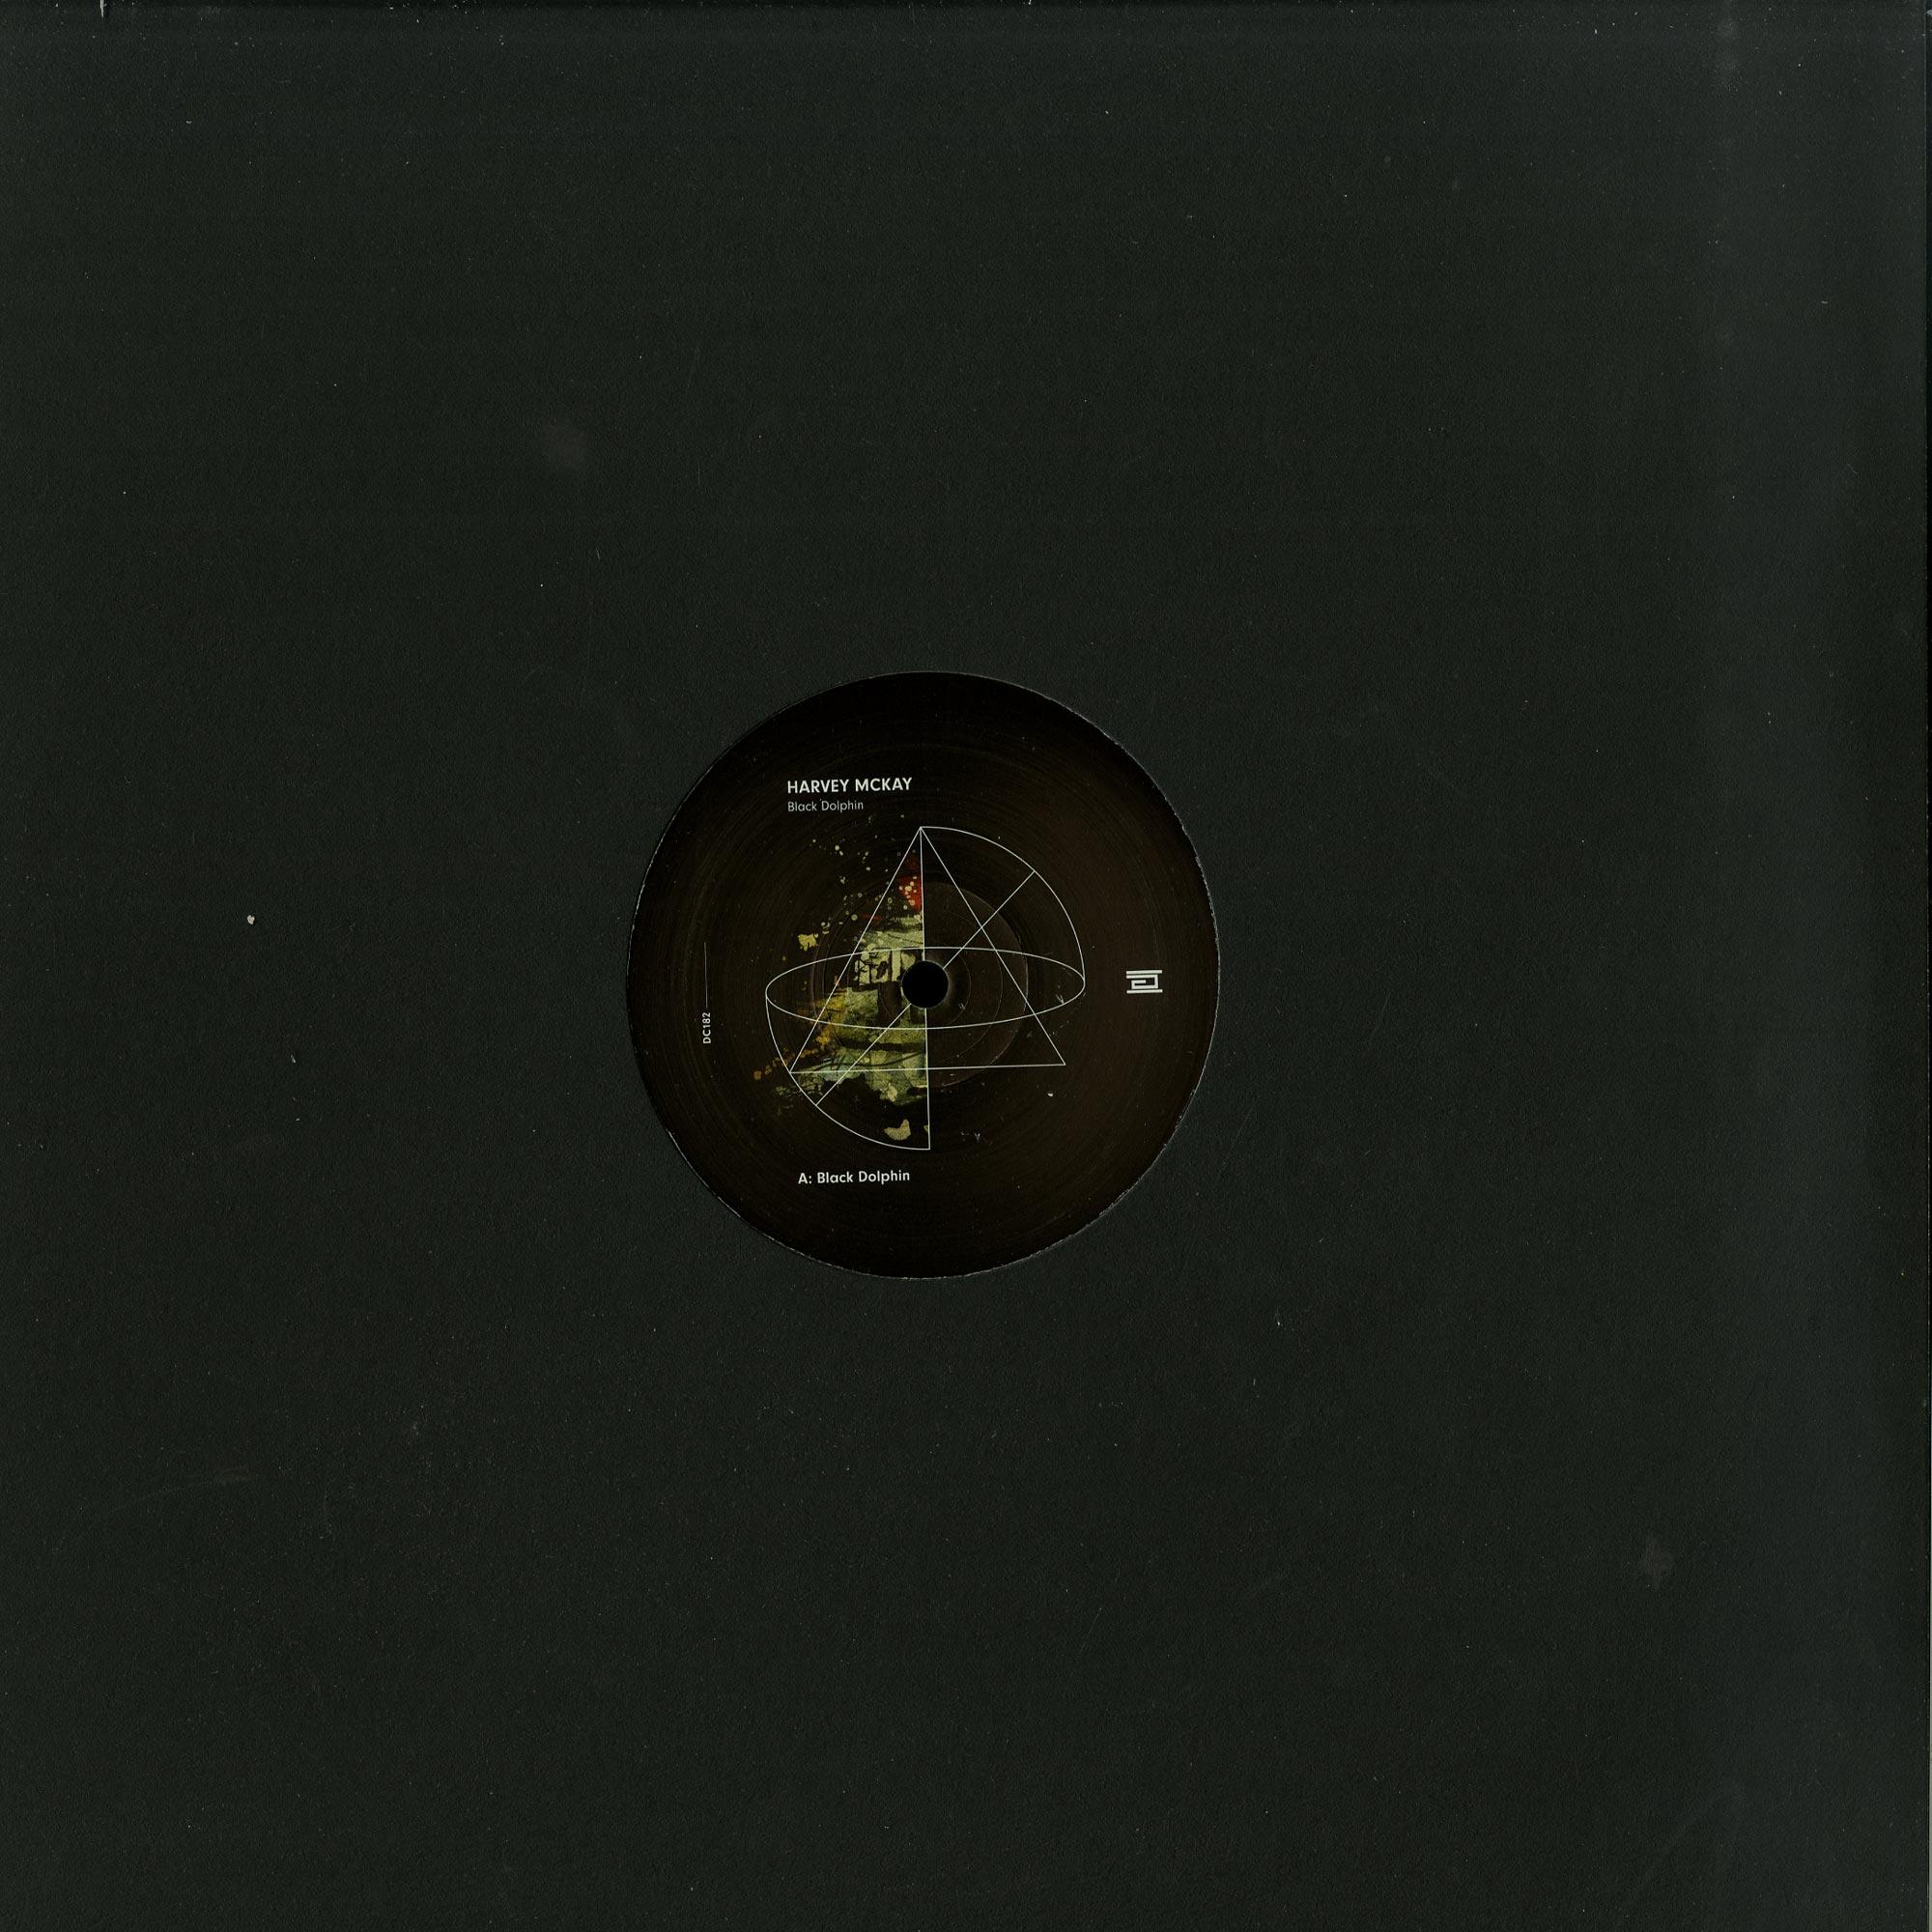 Harvey McKay - BLACK DOLPHIN